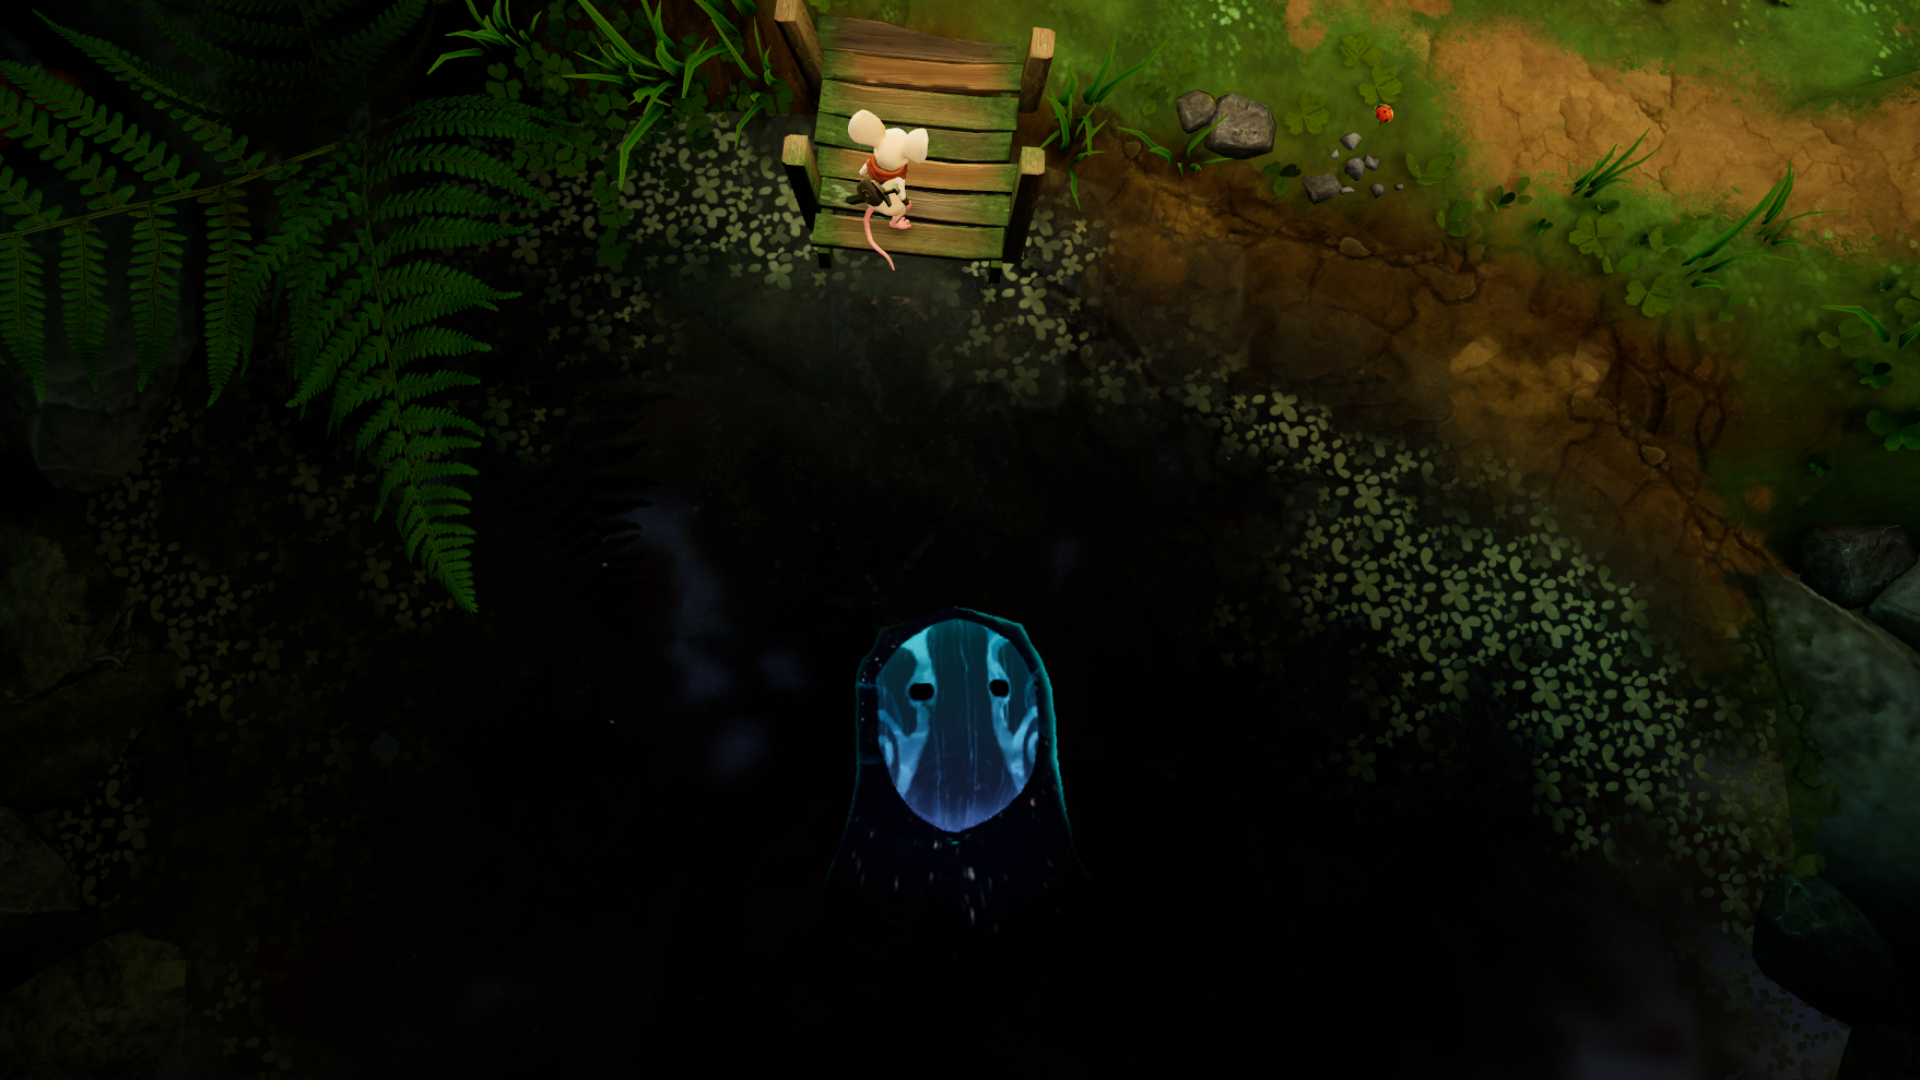 VRゲーム【Moss】自分のポジション設定がしっくりくる